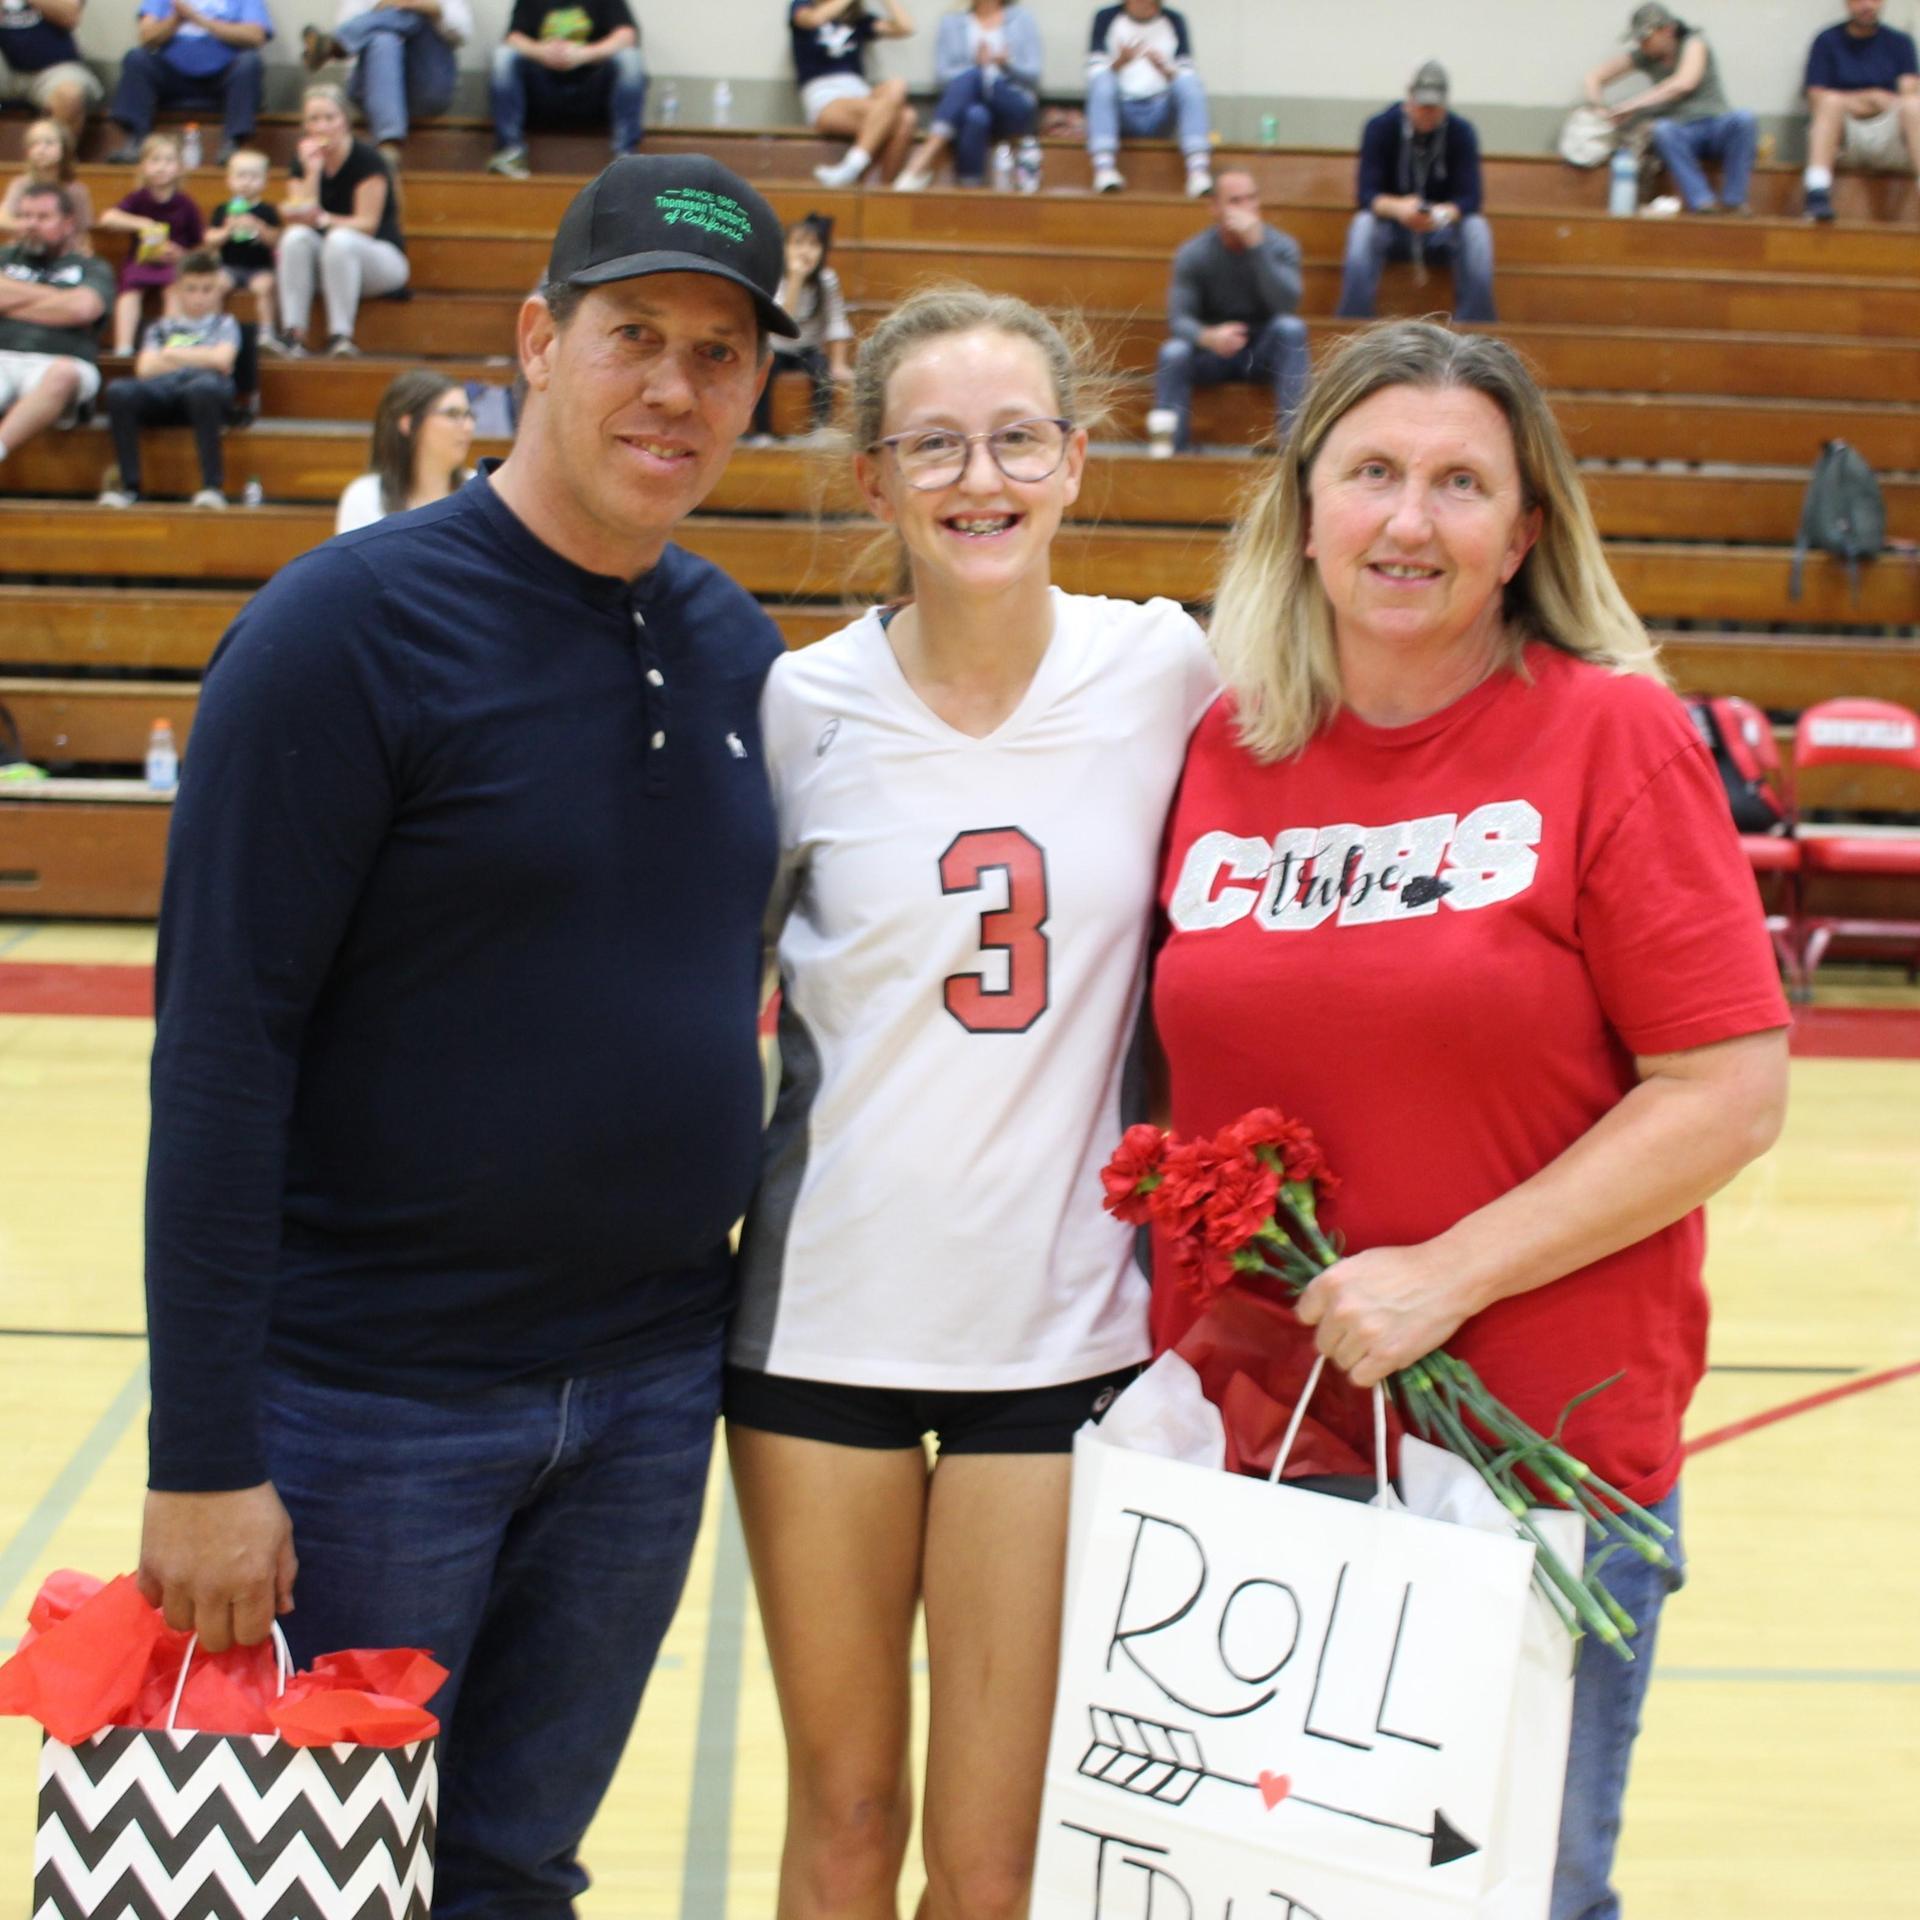 Lauren Bass with family